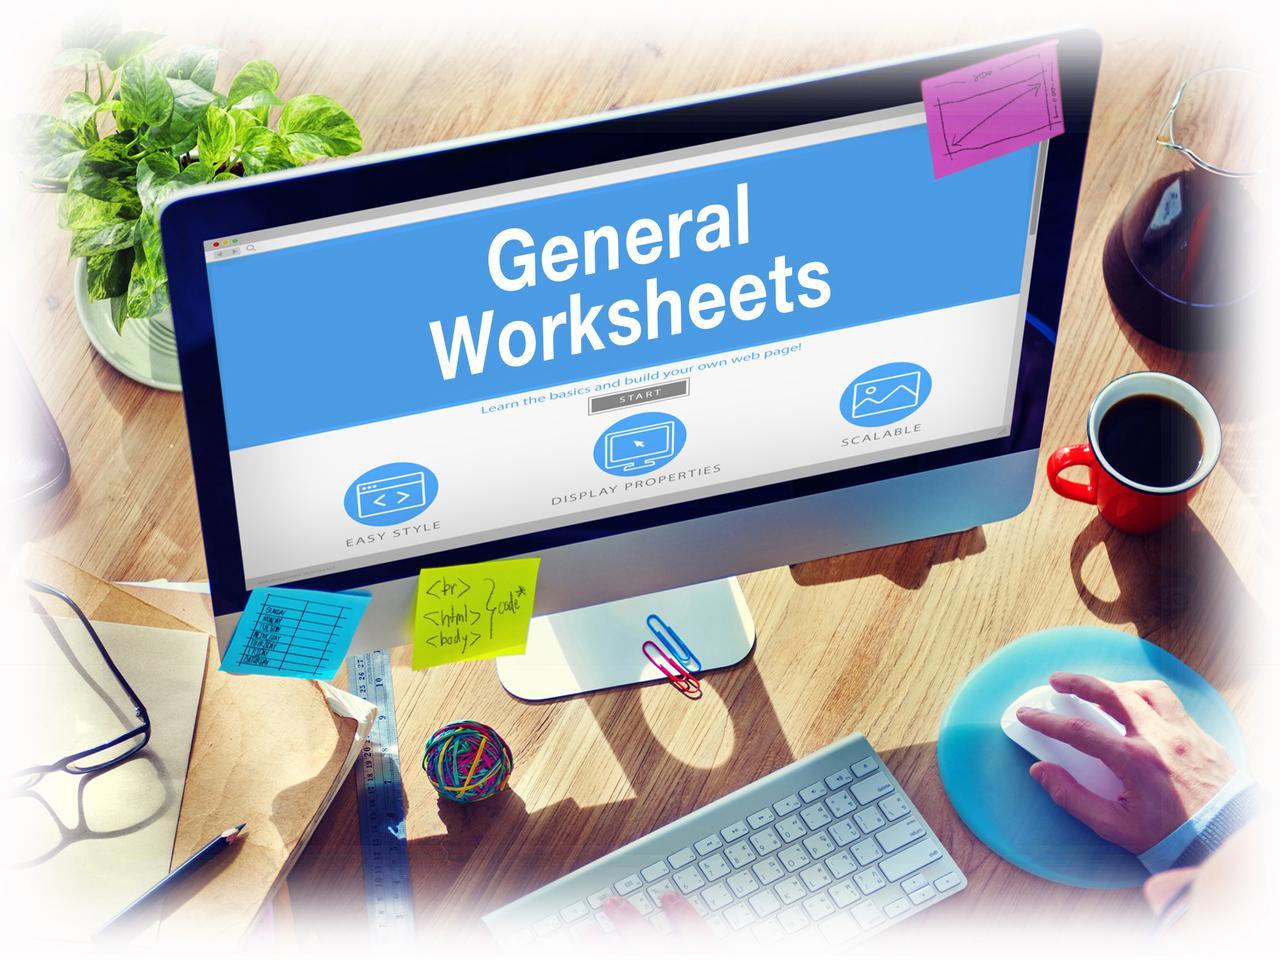 computer image - general worksheets.jpg